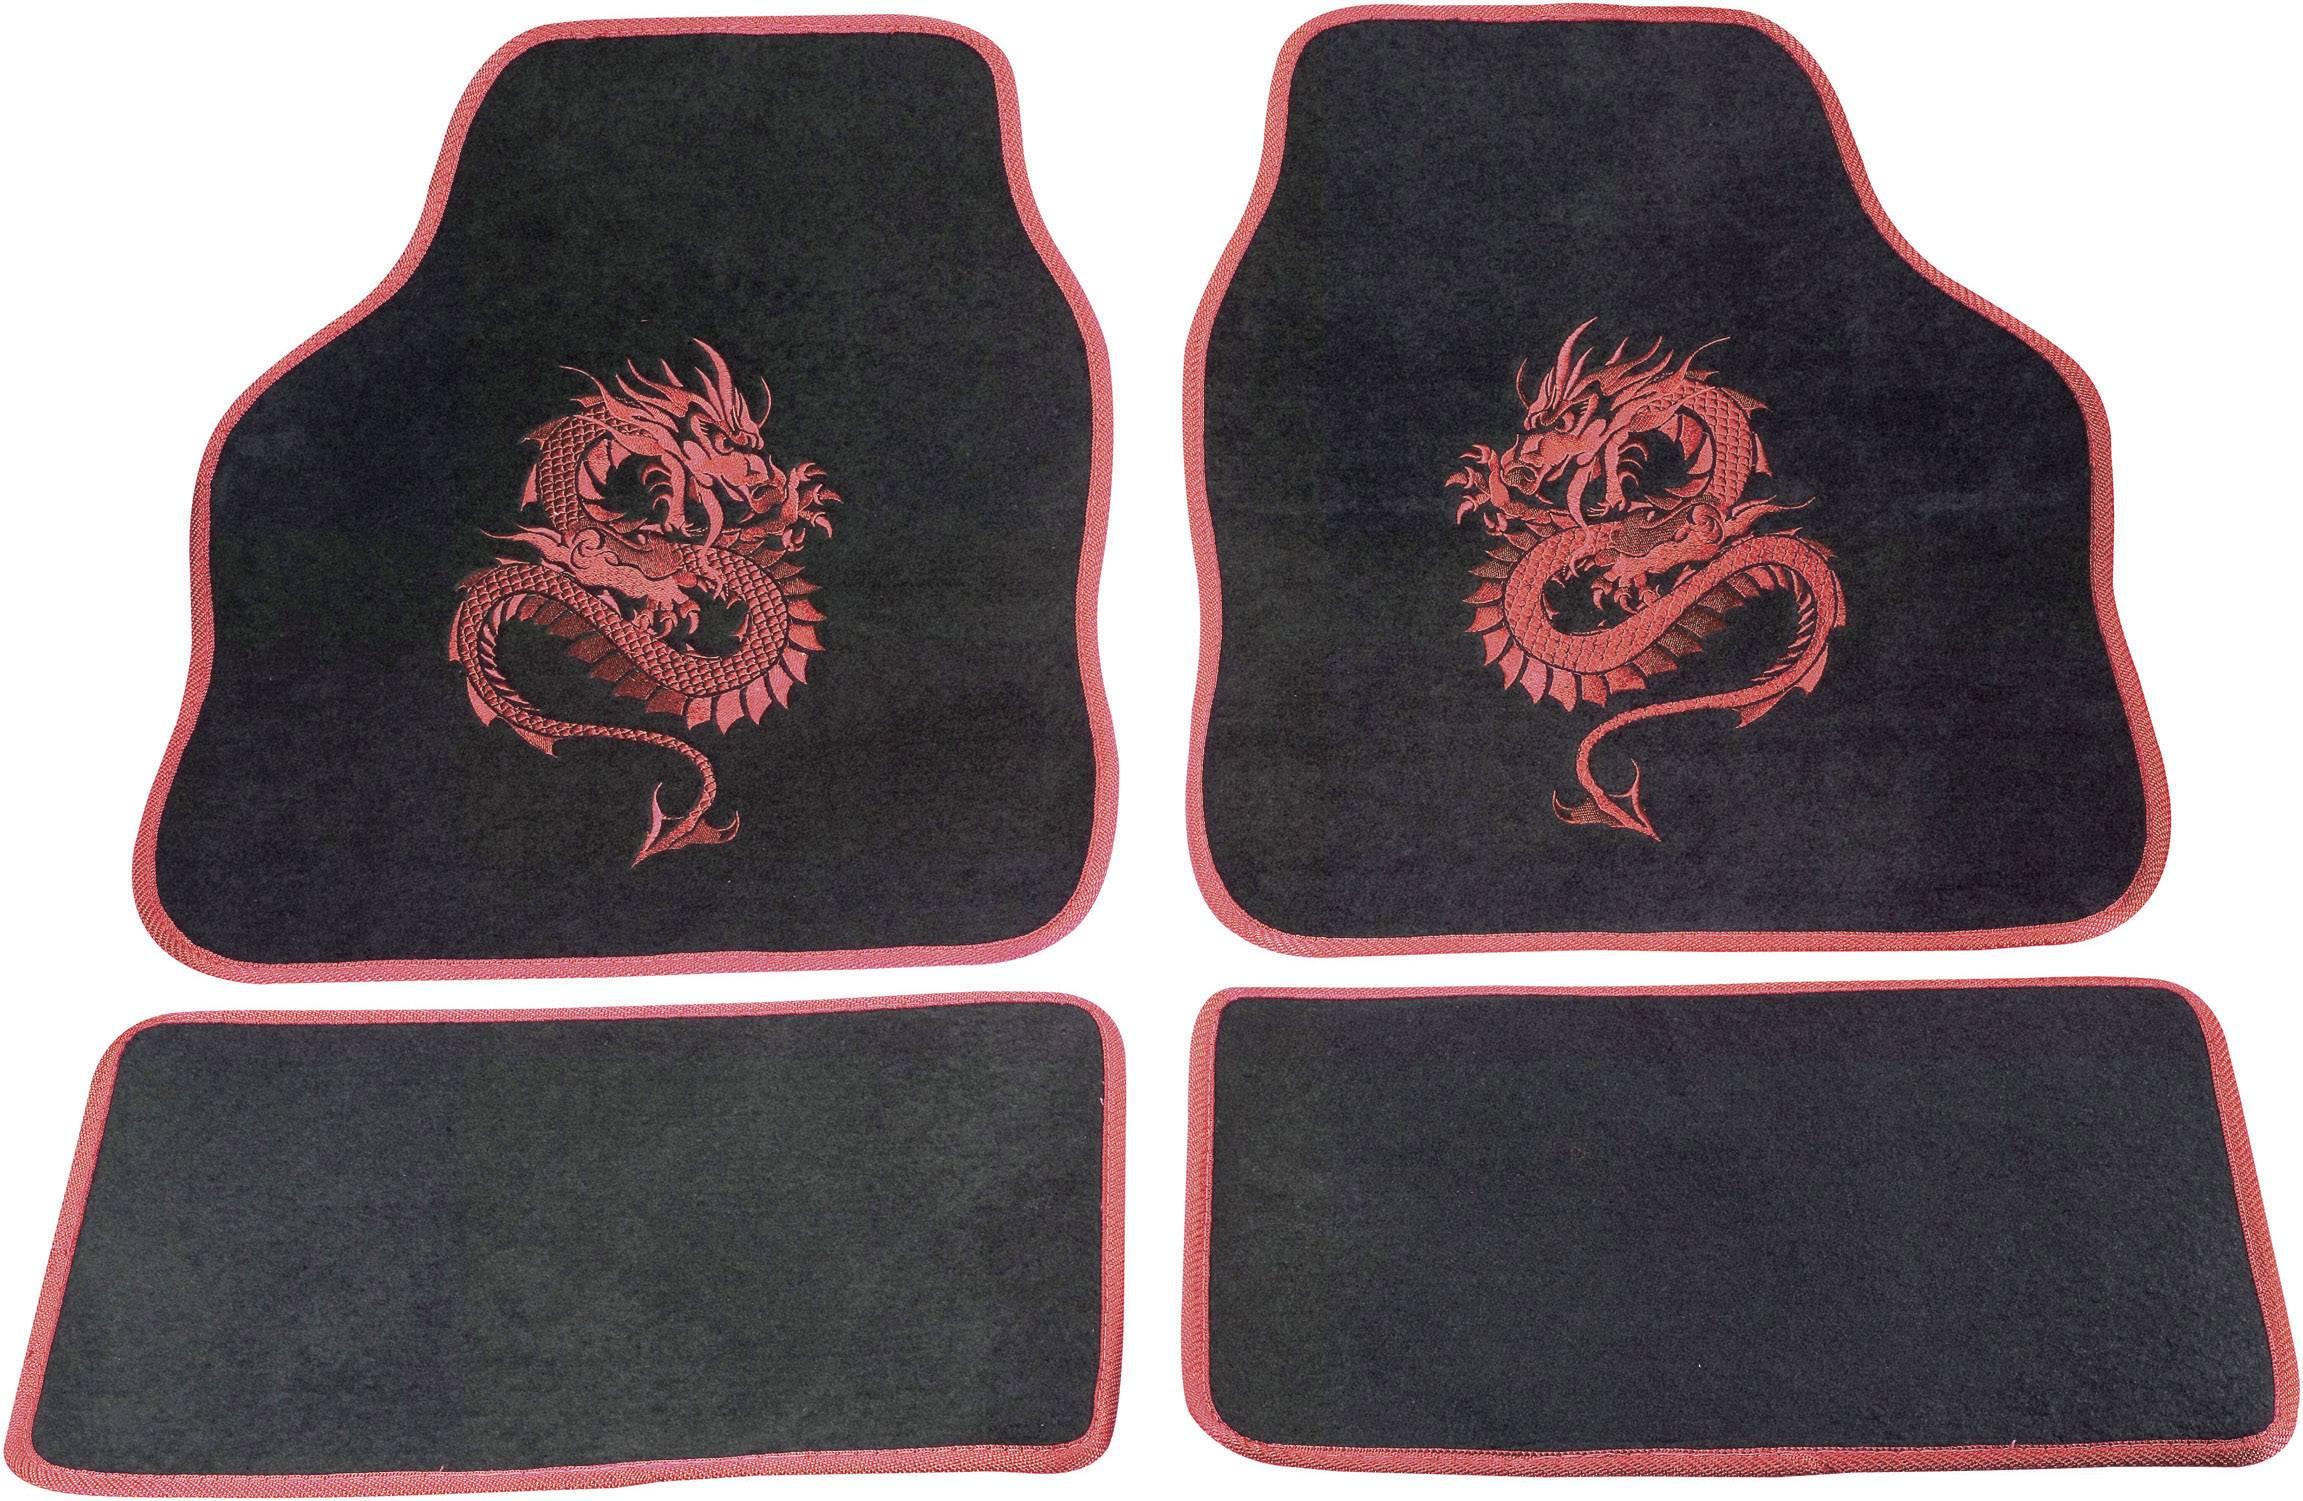 Univerzálna autorohožka do auta cartrend 1400-02 1400-02, textil, červená